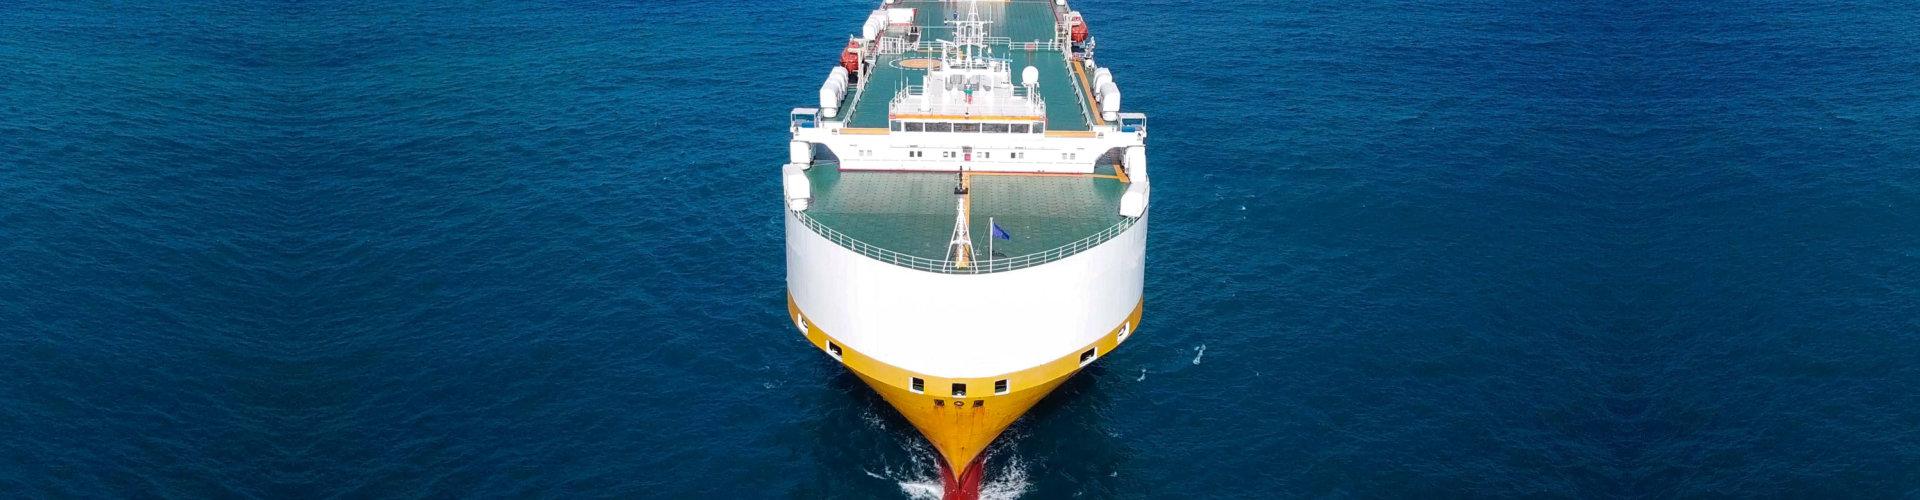 large roro vessel cruising the Mediterranean sea